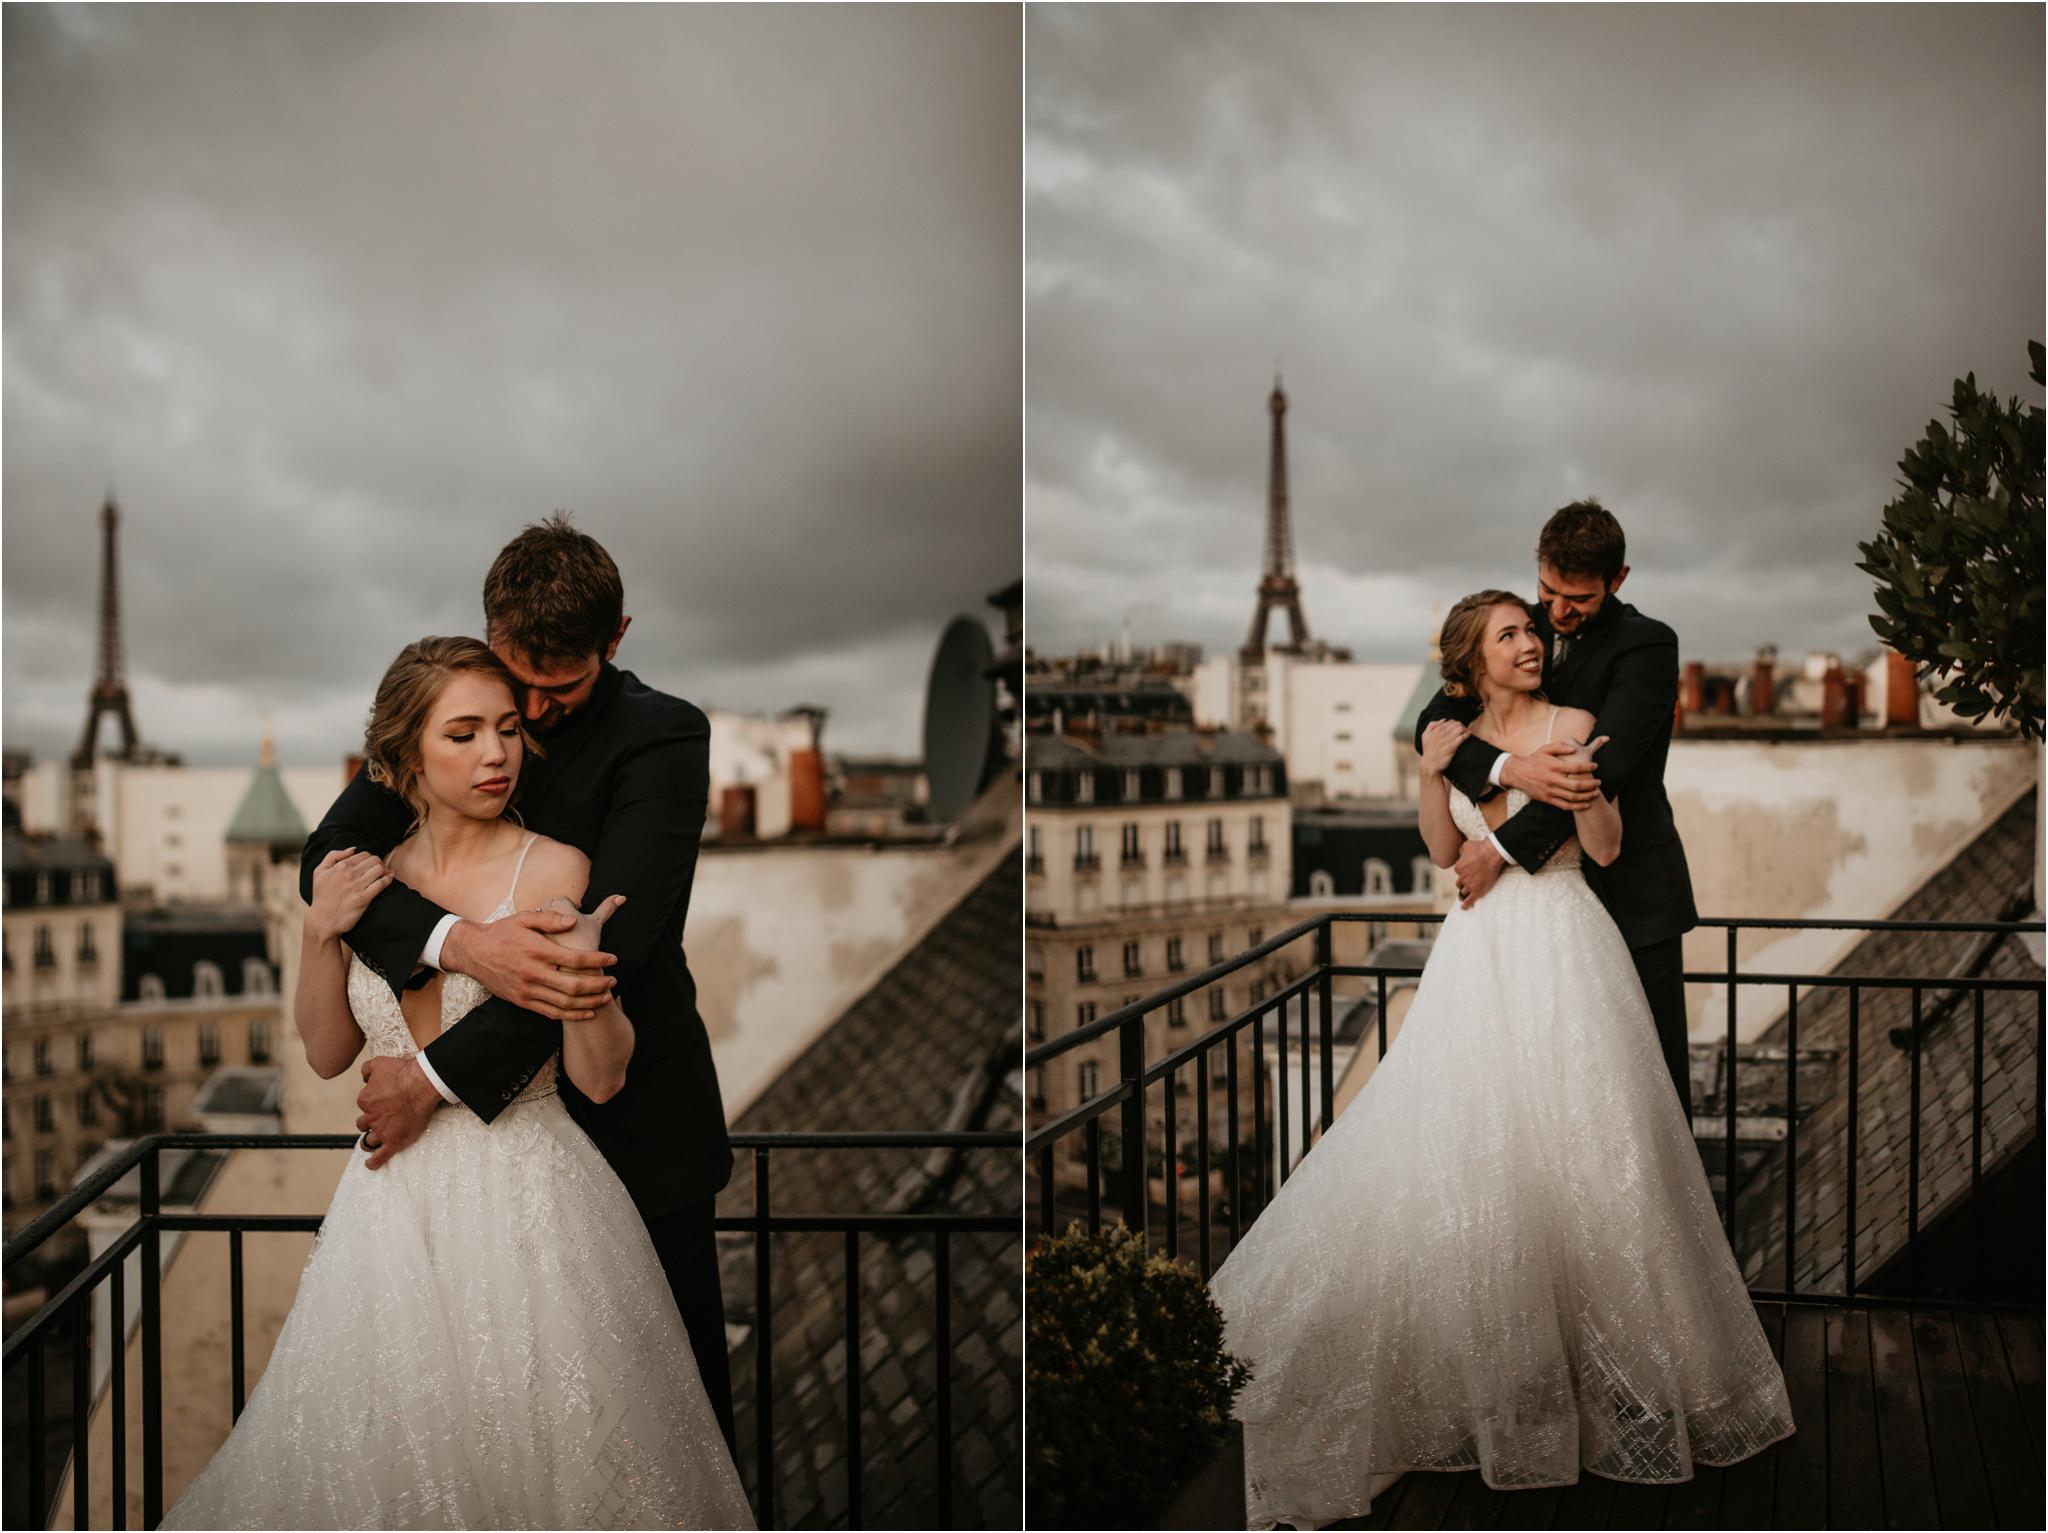 miranda-and-jared-paris-elopement-destination-wedding-photographer-024.jpg